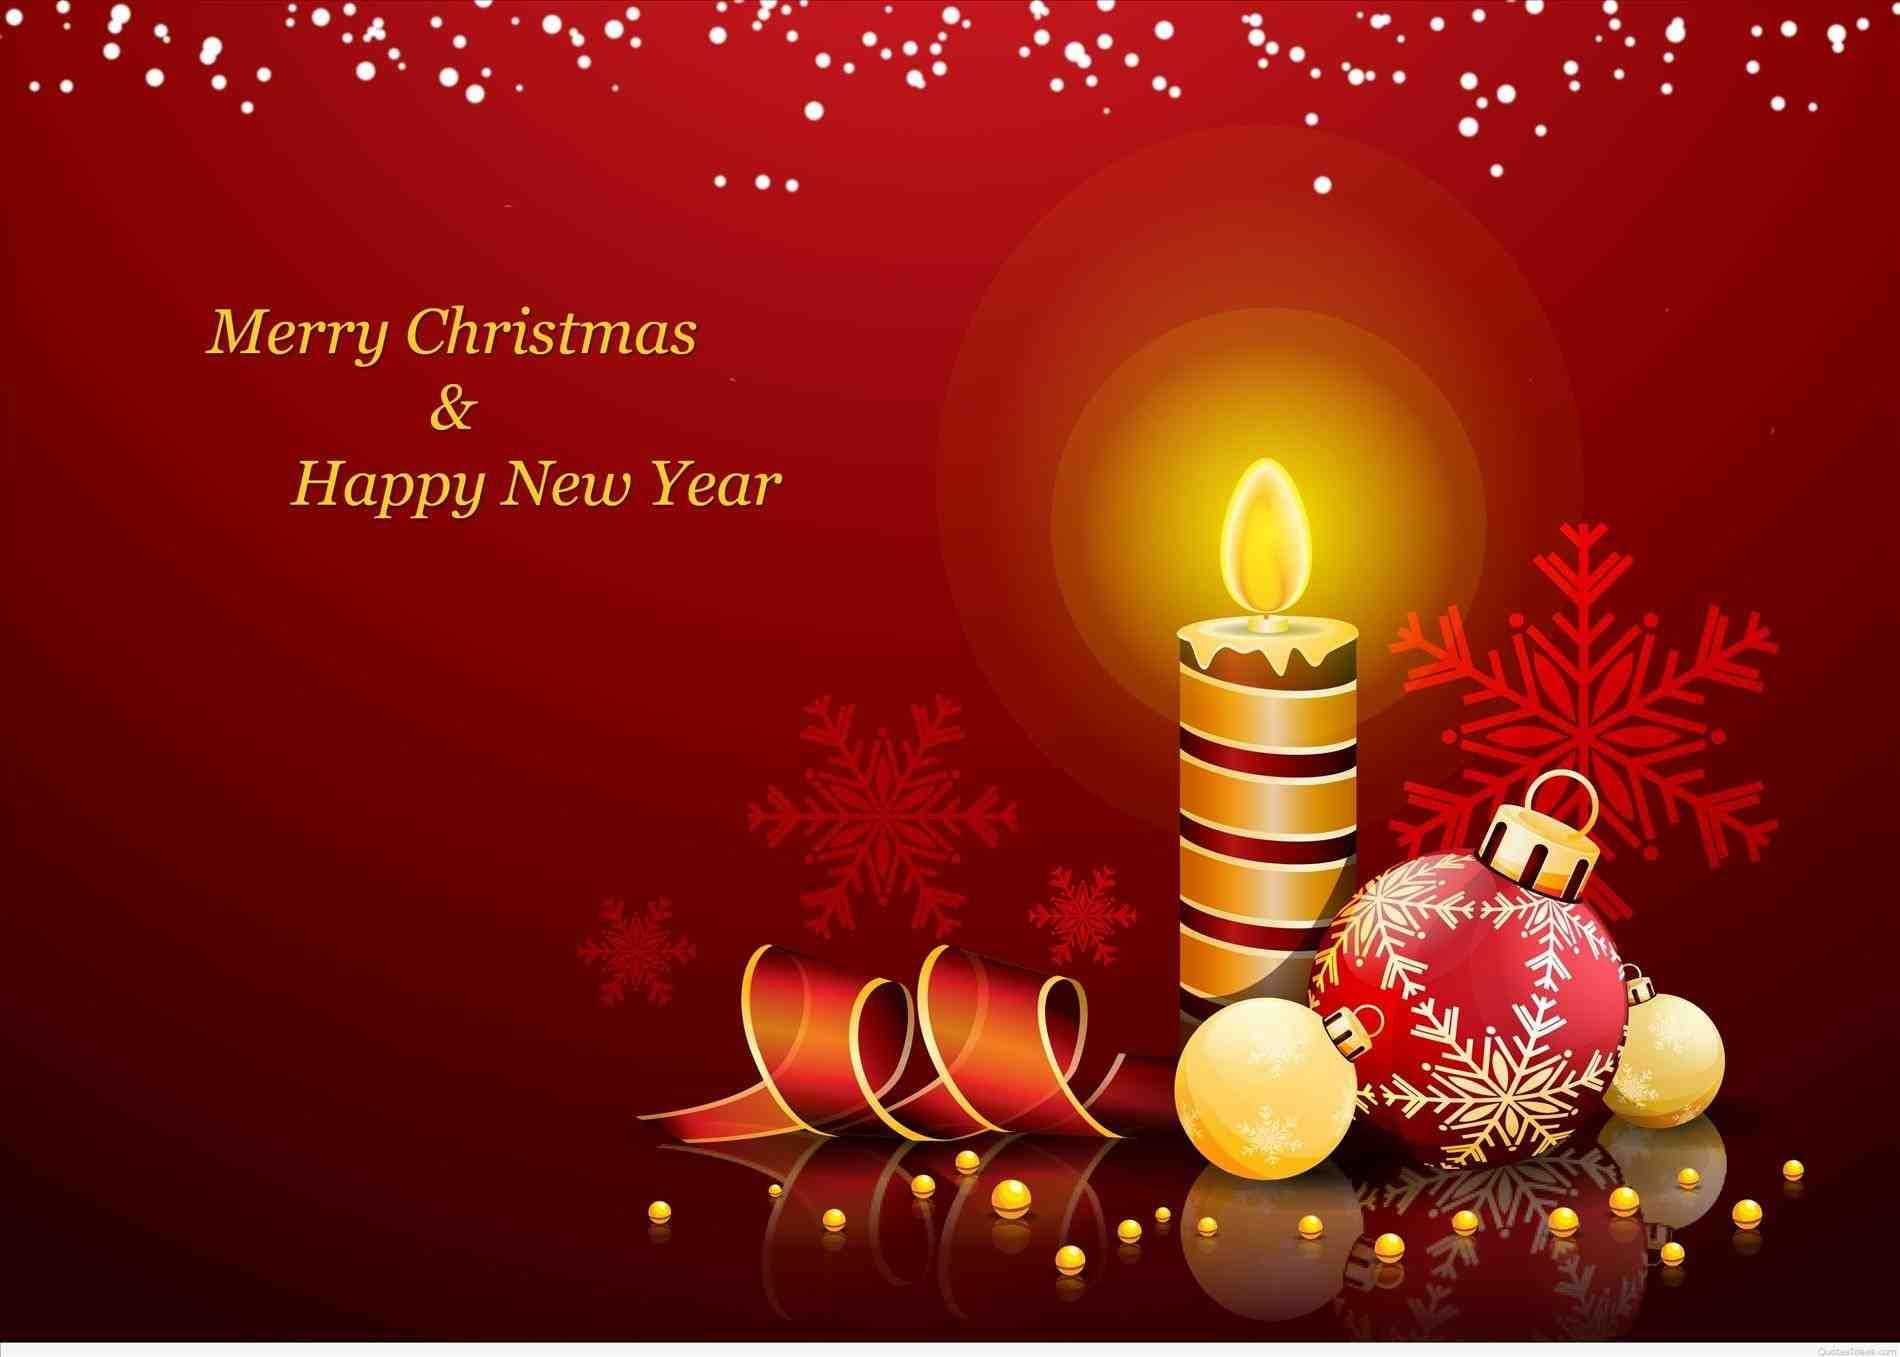 New Post Animated Christmas Images Free Xmast Pinterest